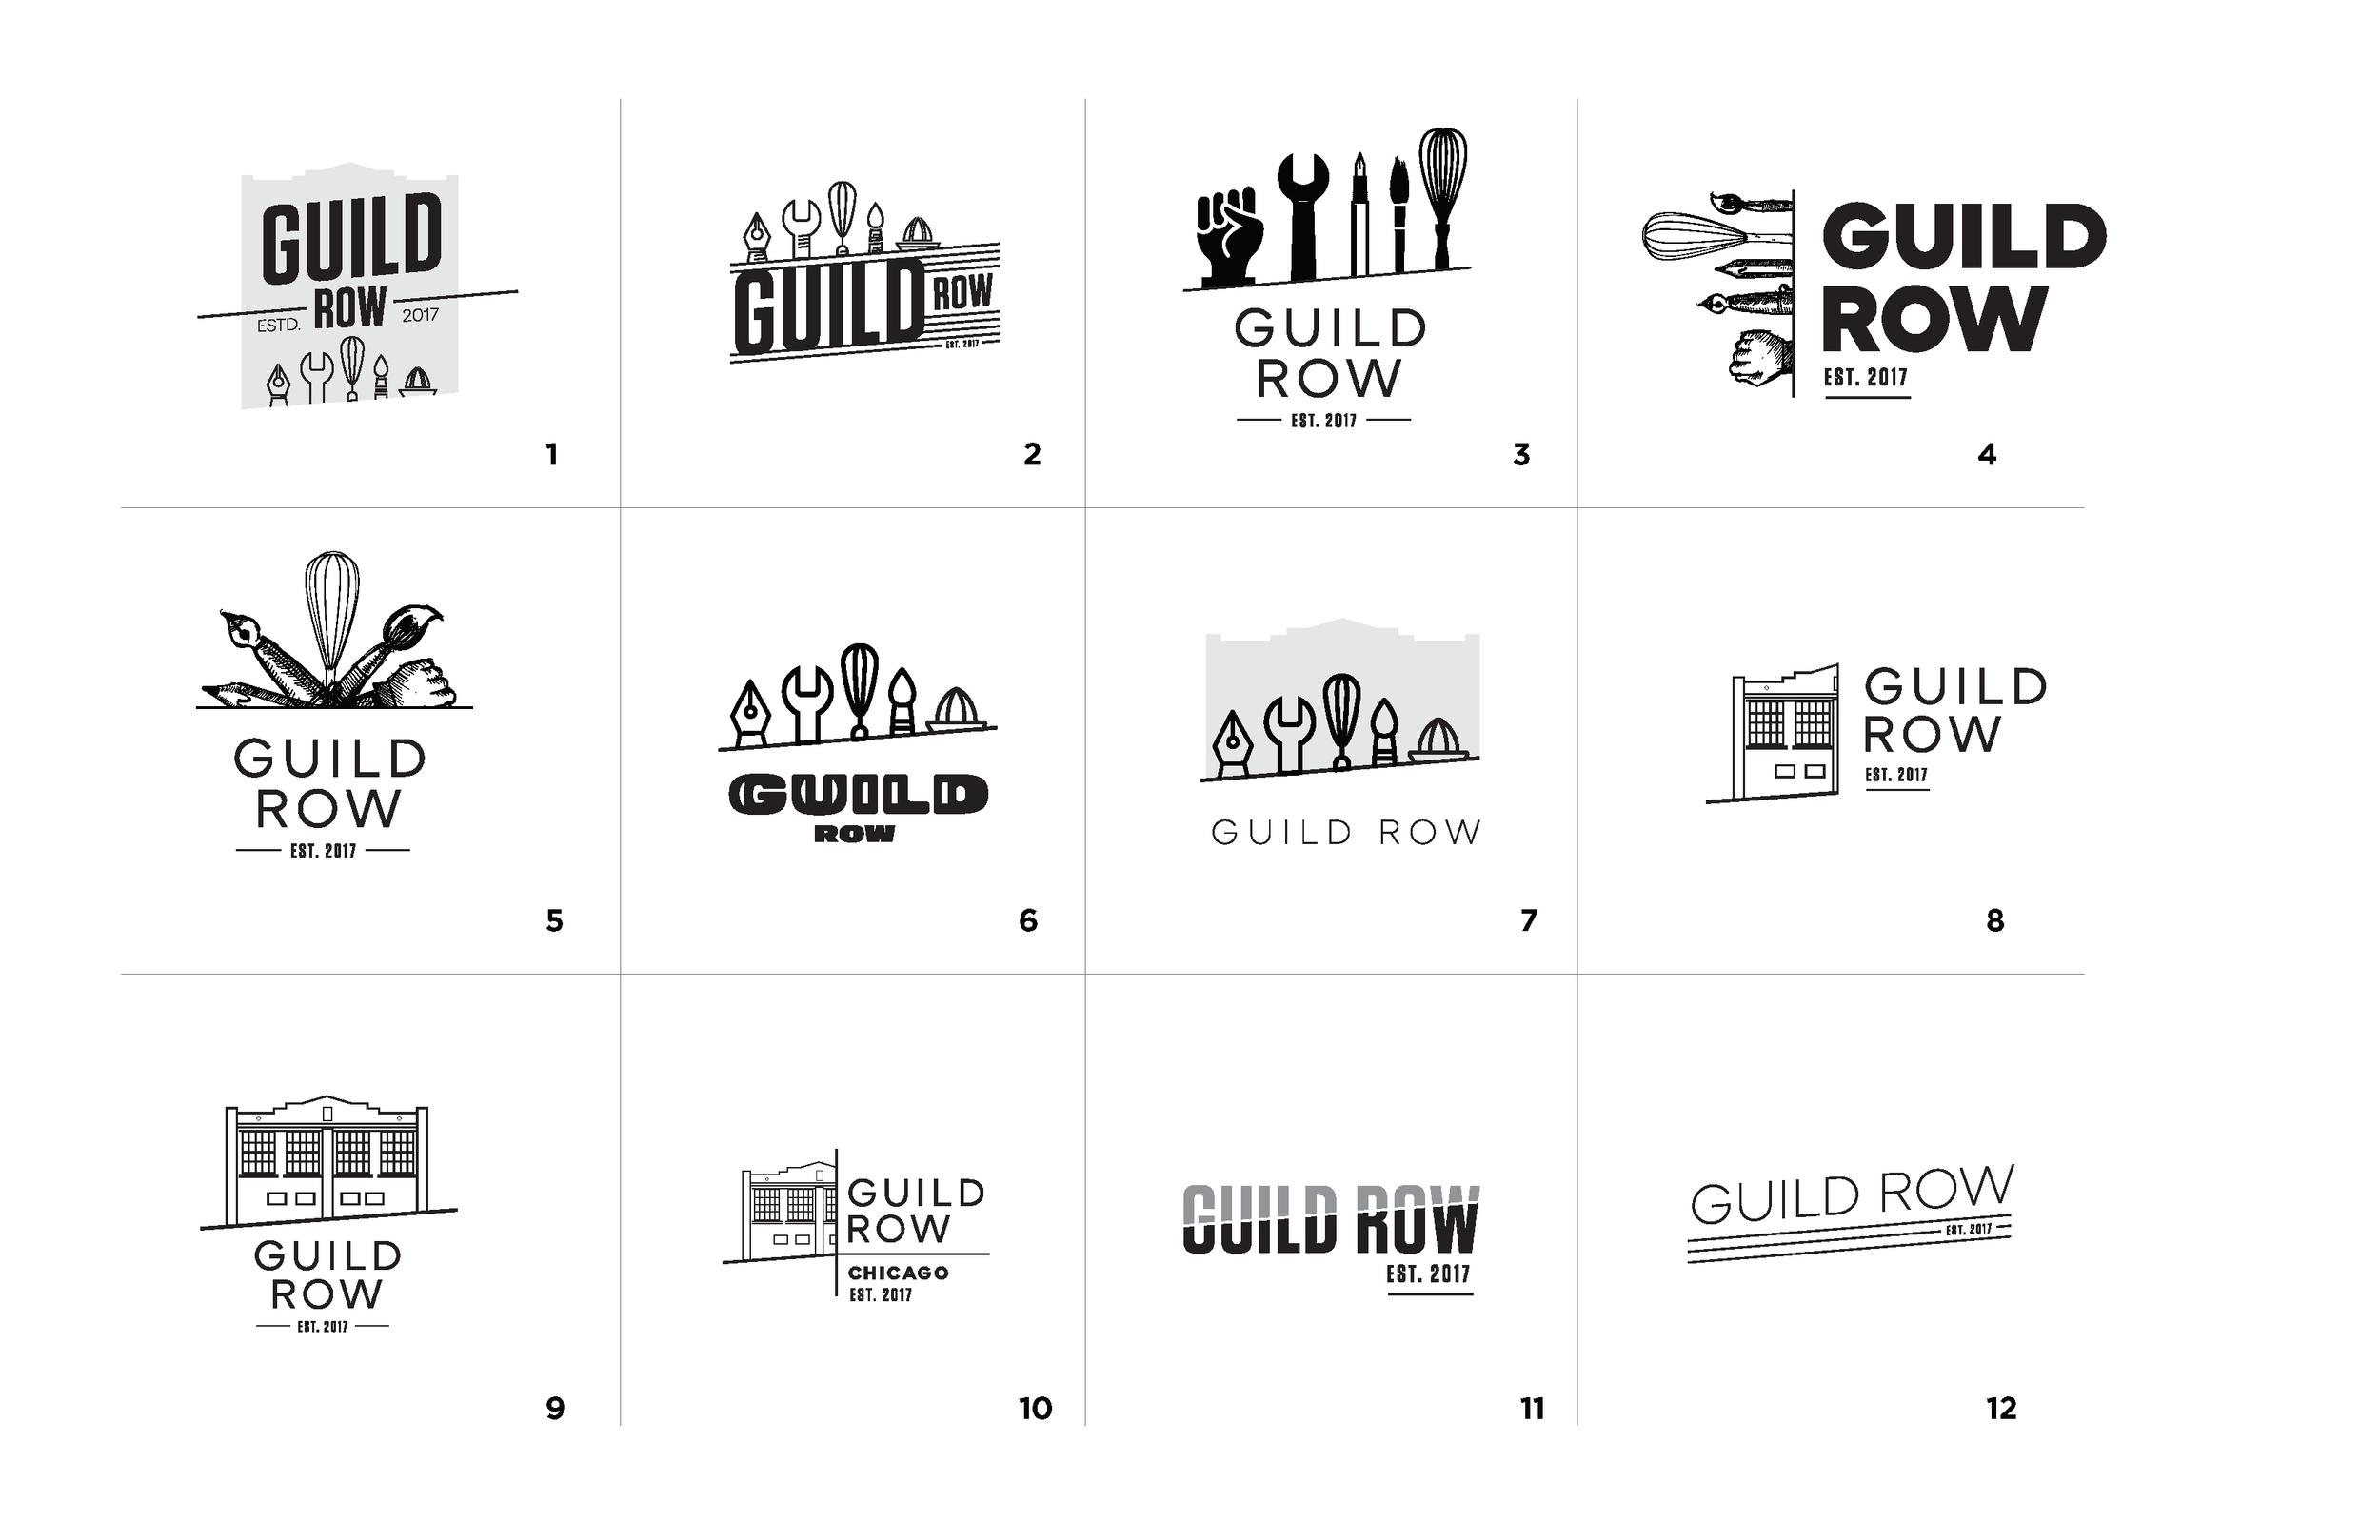 Design Concepts - Round 2